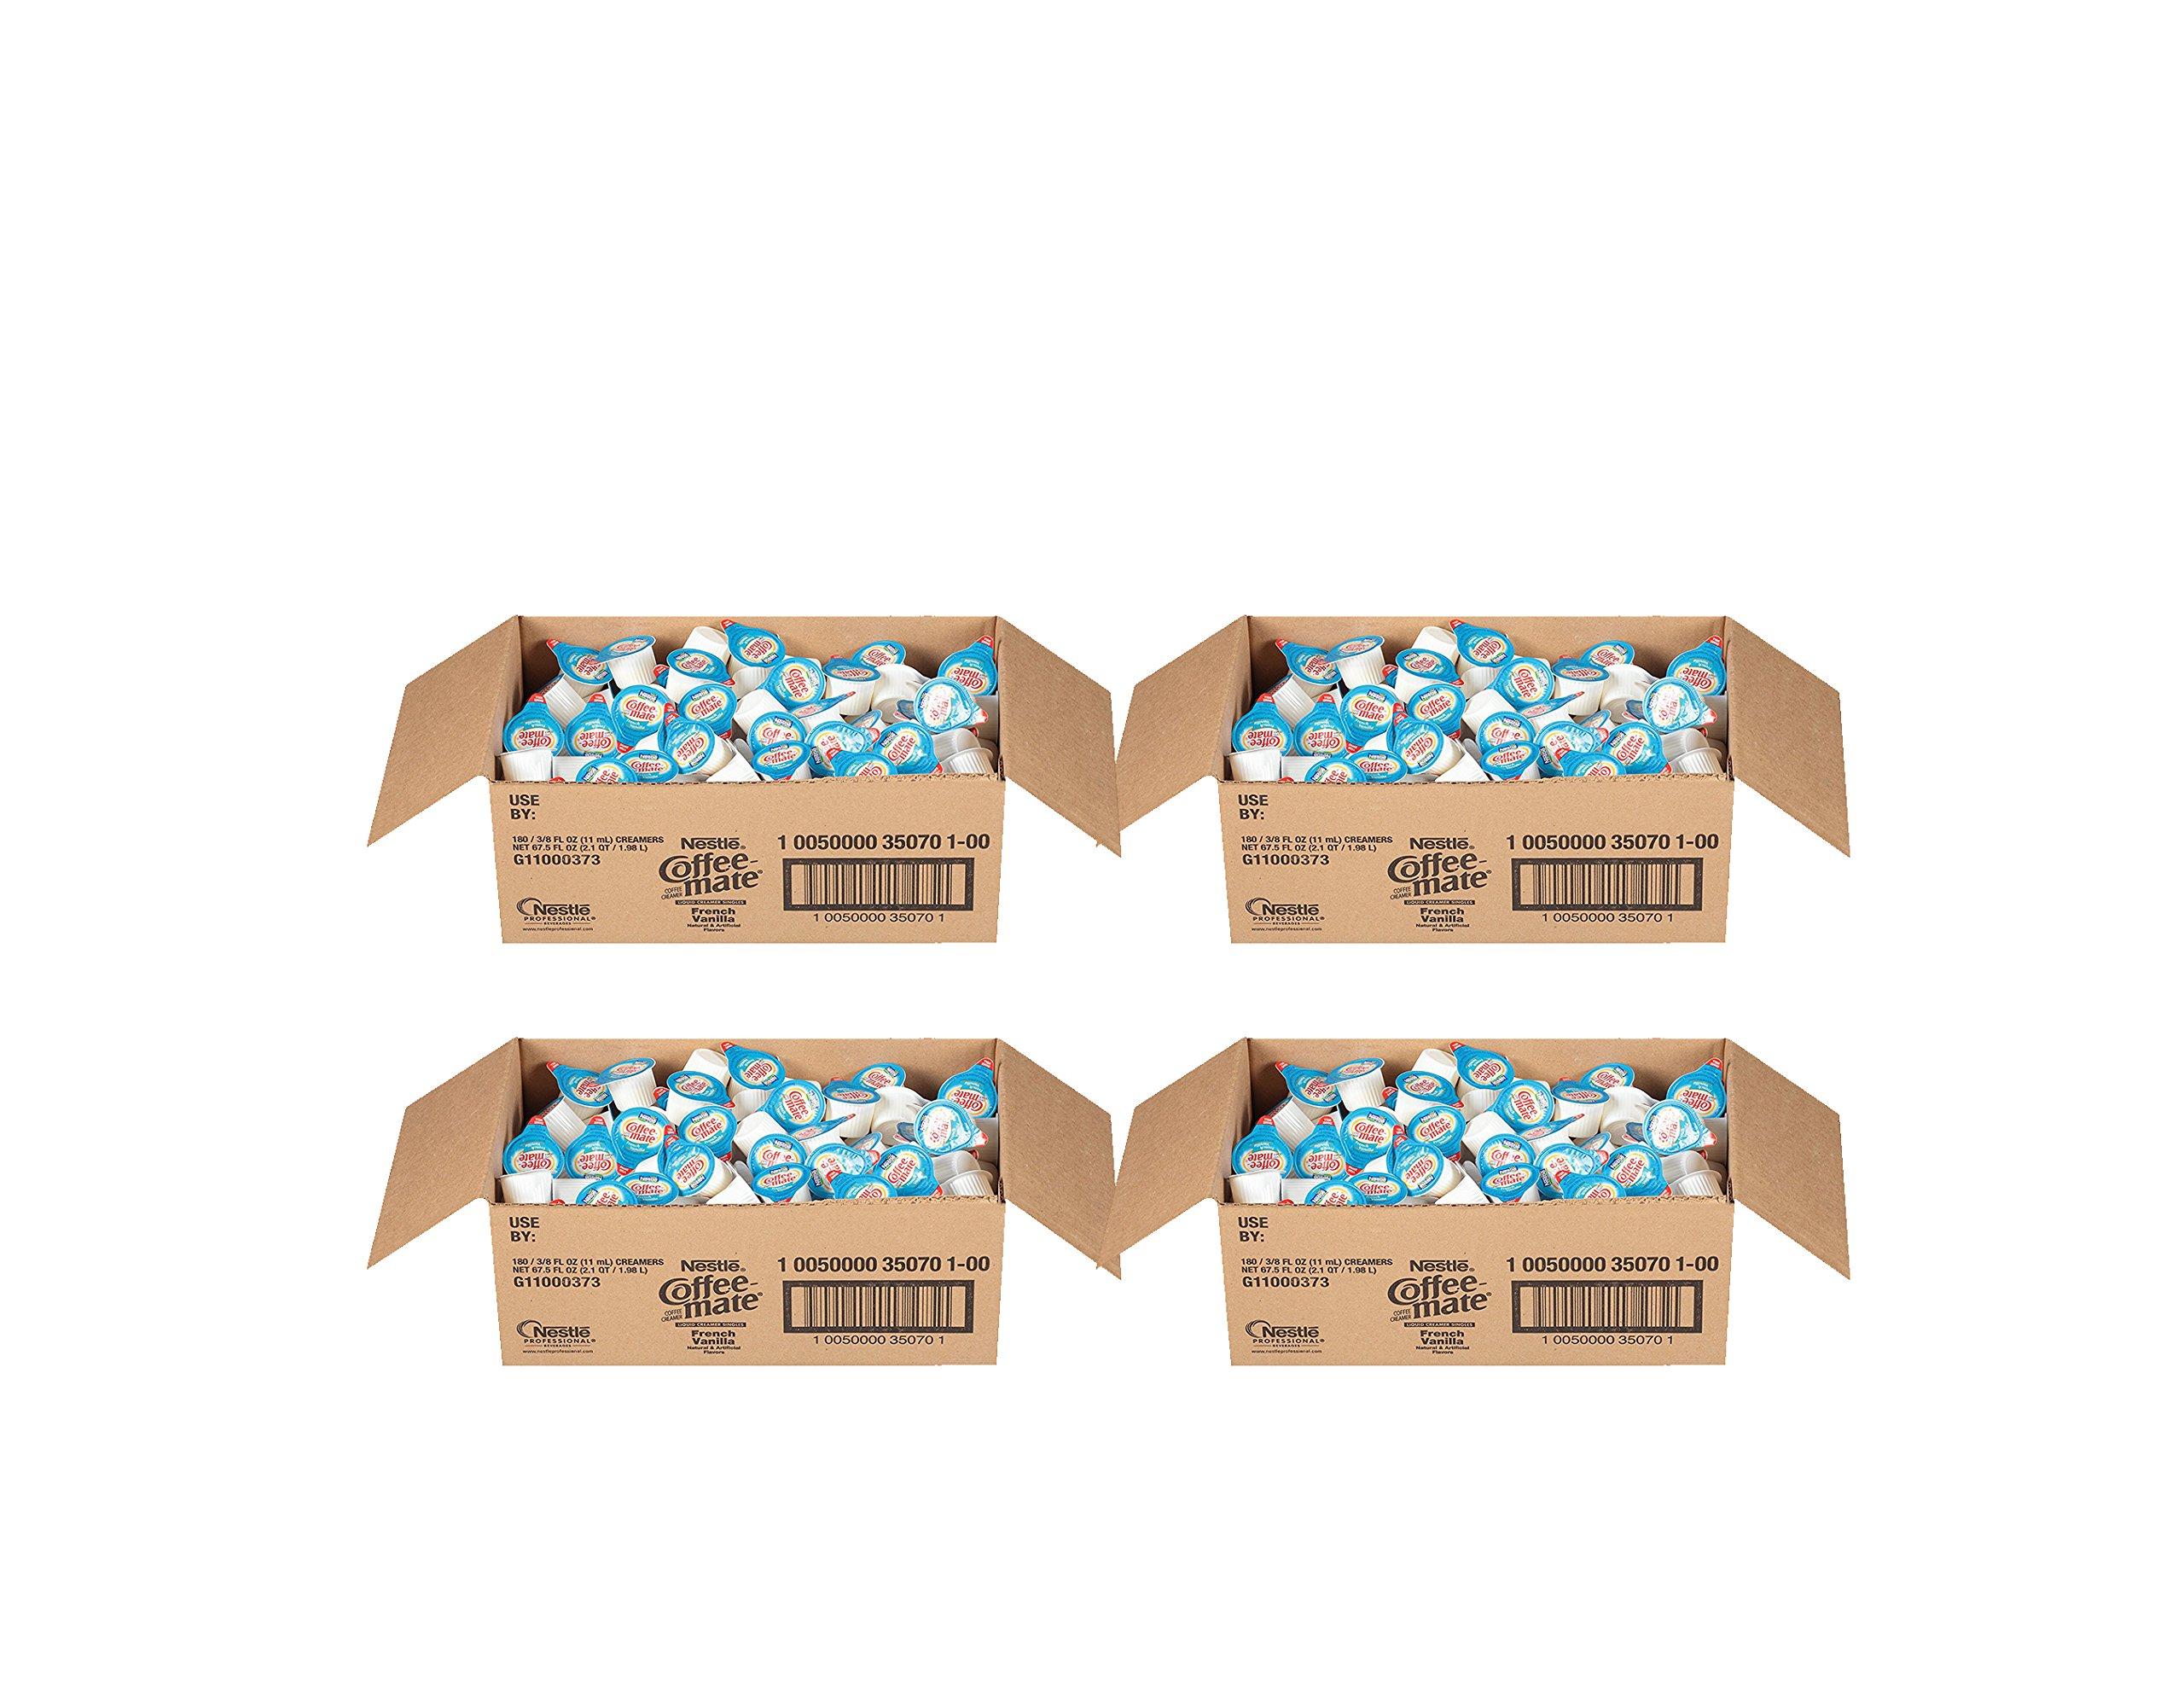 NESTLE COFFEE-MATE Coffee Creamer, French Vanilla, liquid creamer singles, Pack of 720